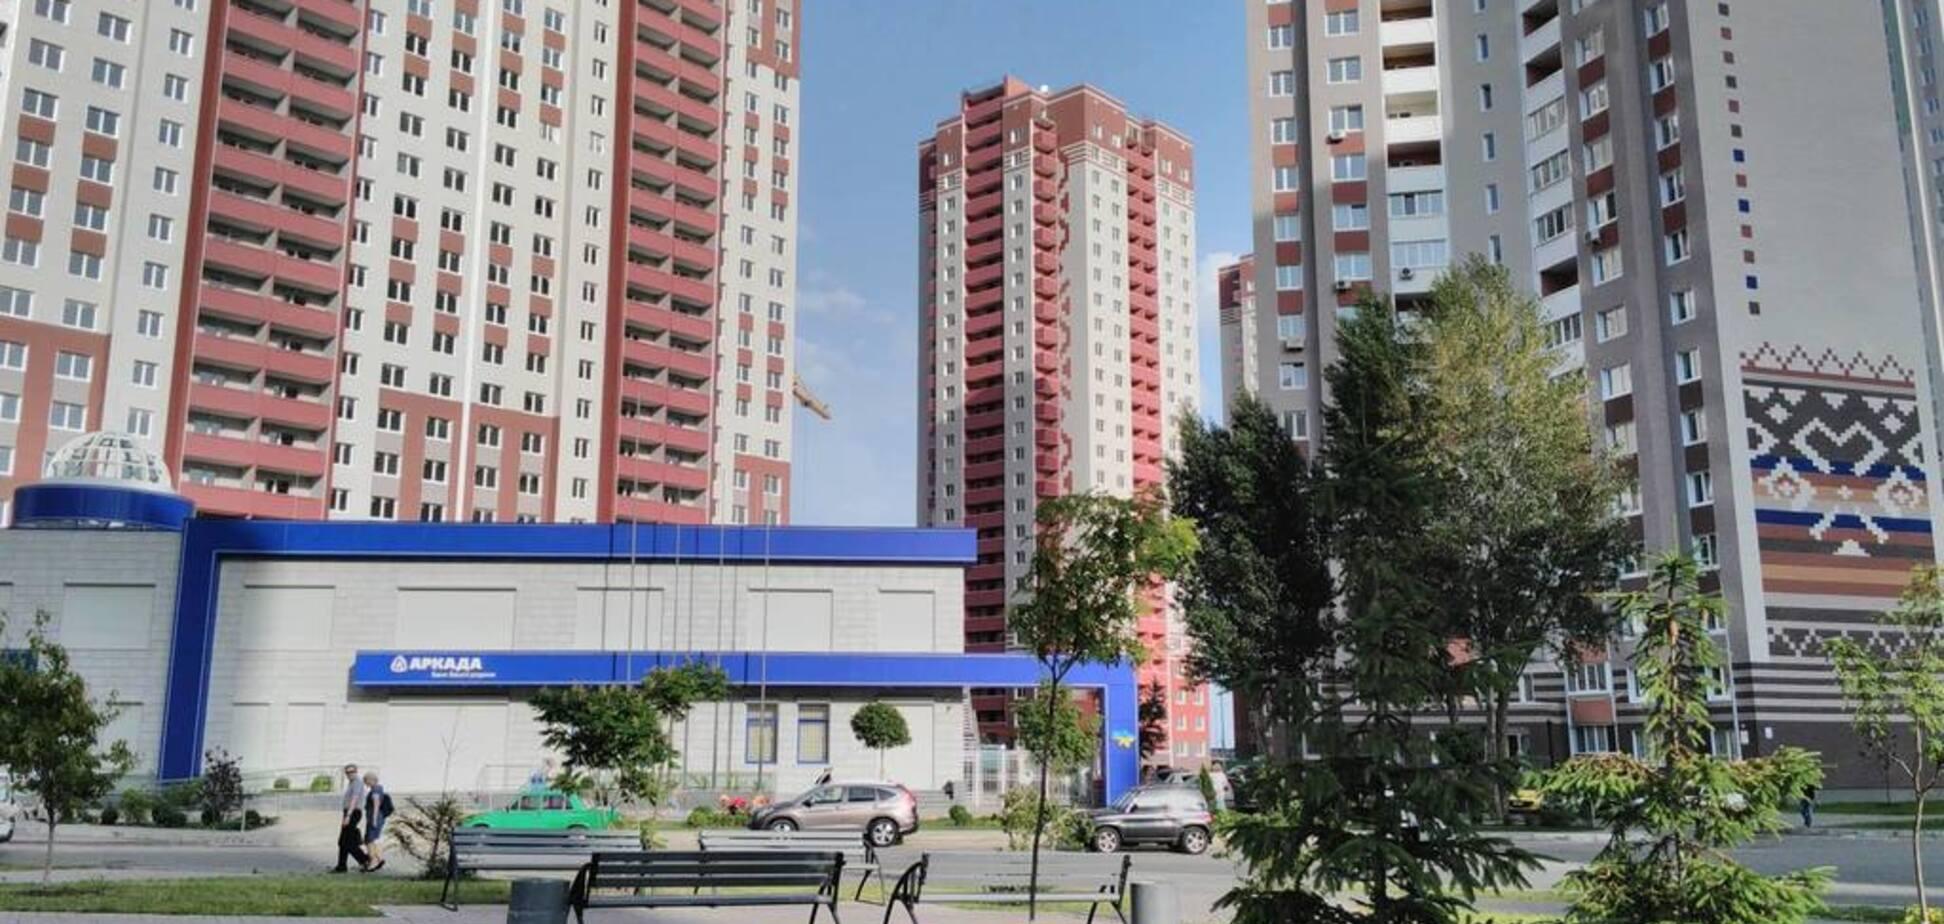 Скандальне будівництво на Осокорках: Київрада поставила крапку в суперечках